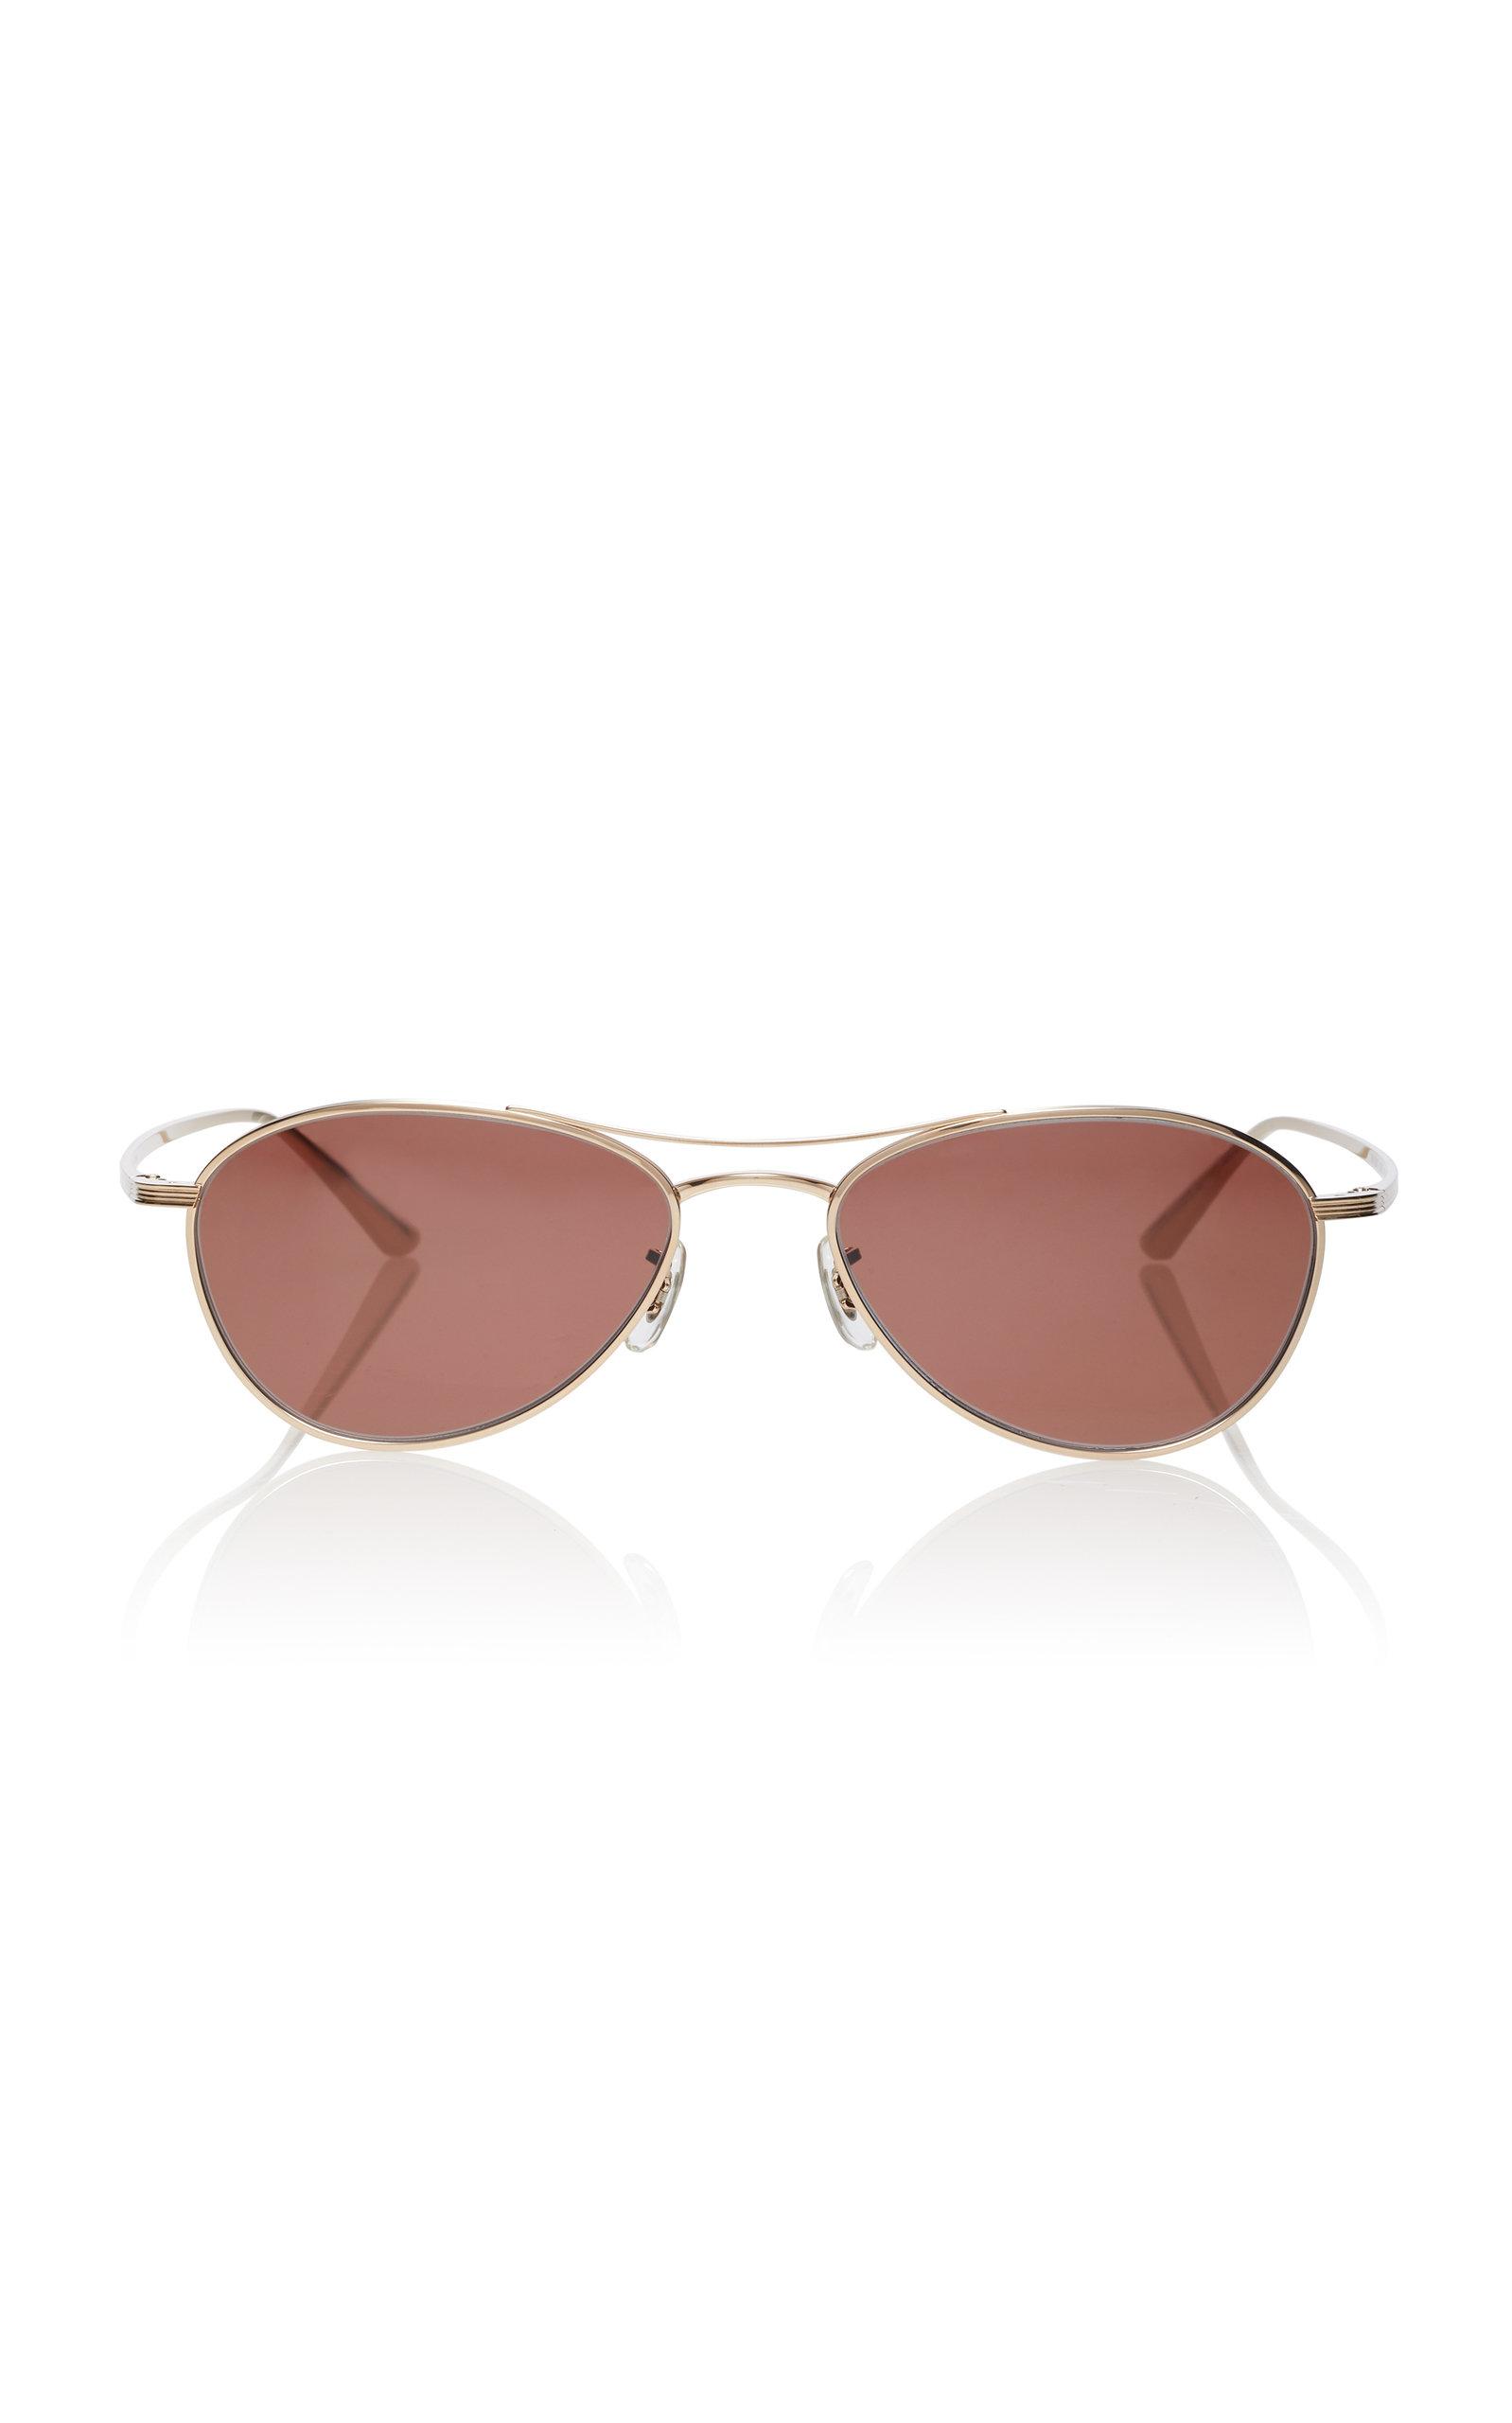 5cb8eaf89a42d Oliver Peoples THE ROWAero LA Aviator Sunglasses. CLOSE. Loading